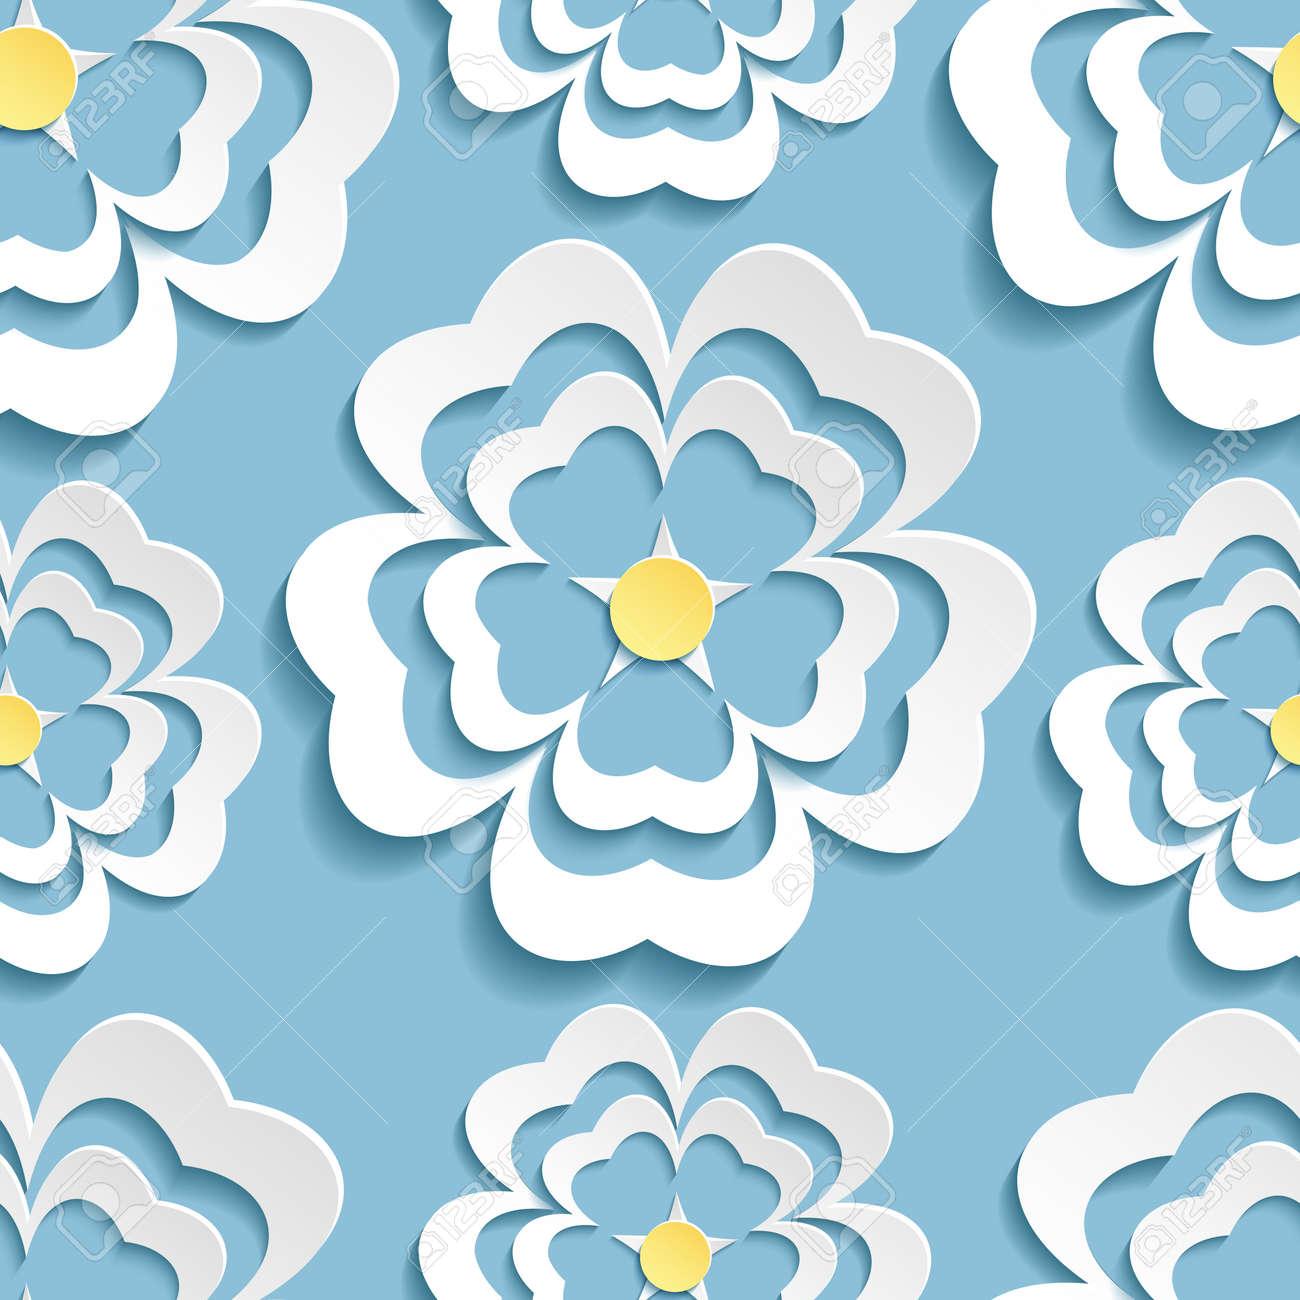 Belle Nature De Fond Moderne Bleu Seamless Cinque Blanc Orne